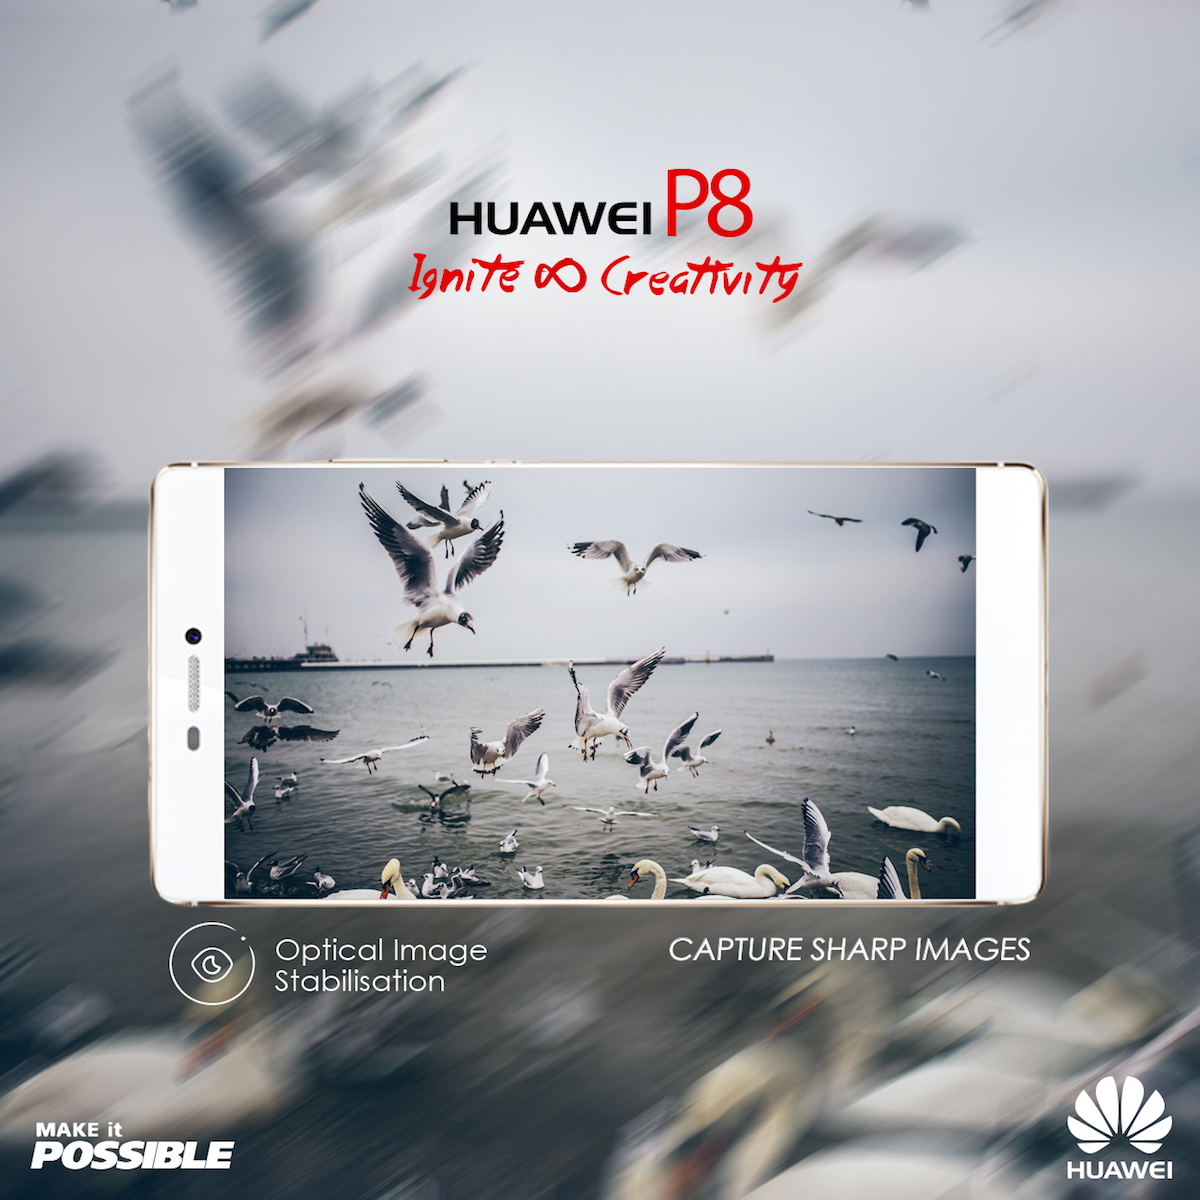 HUAWEI P8 OIS